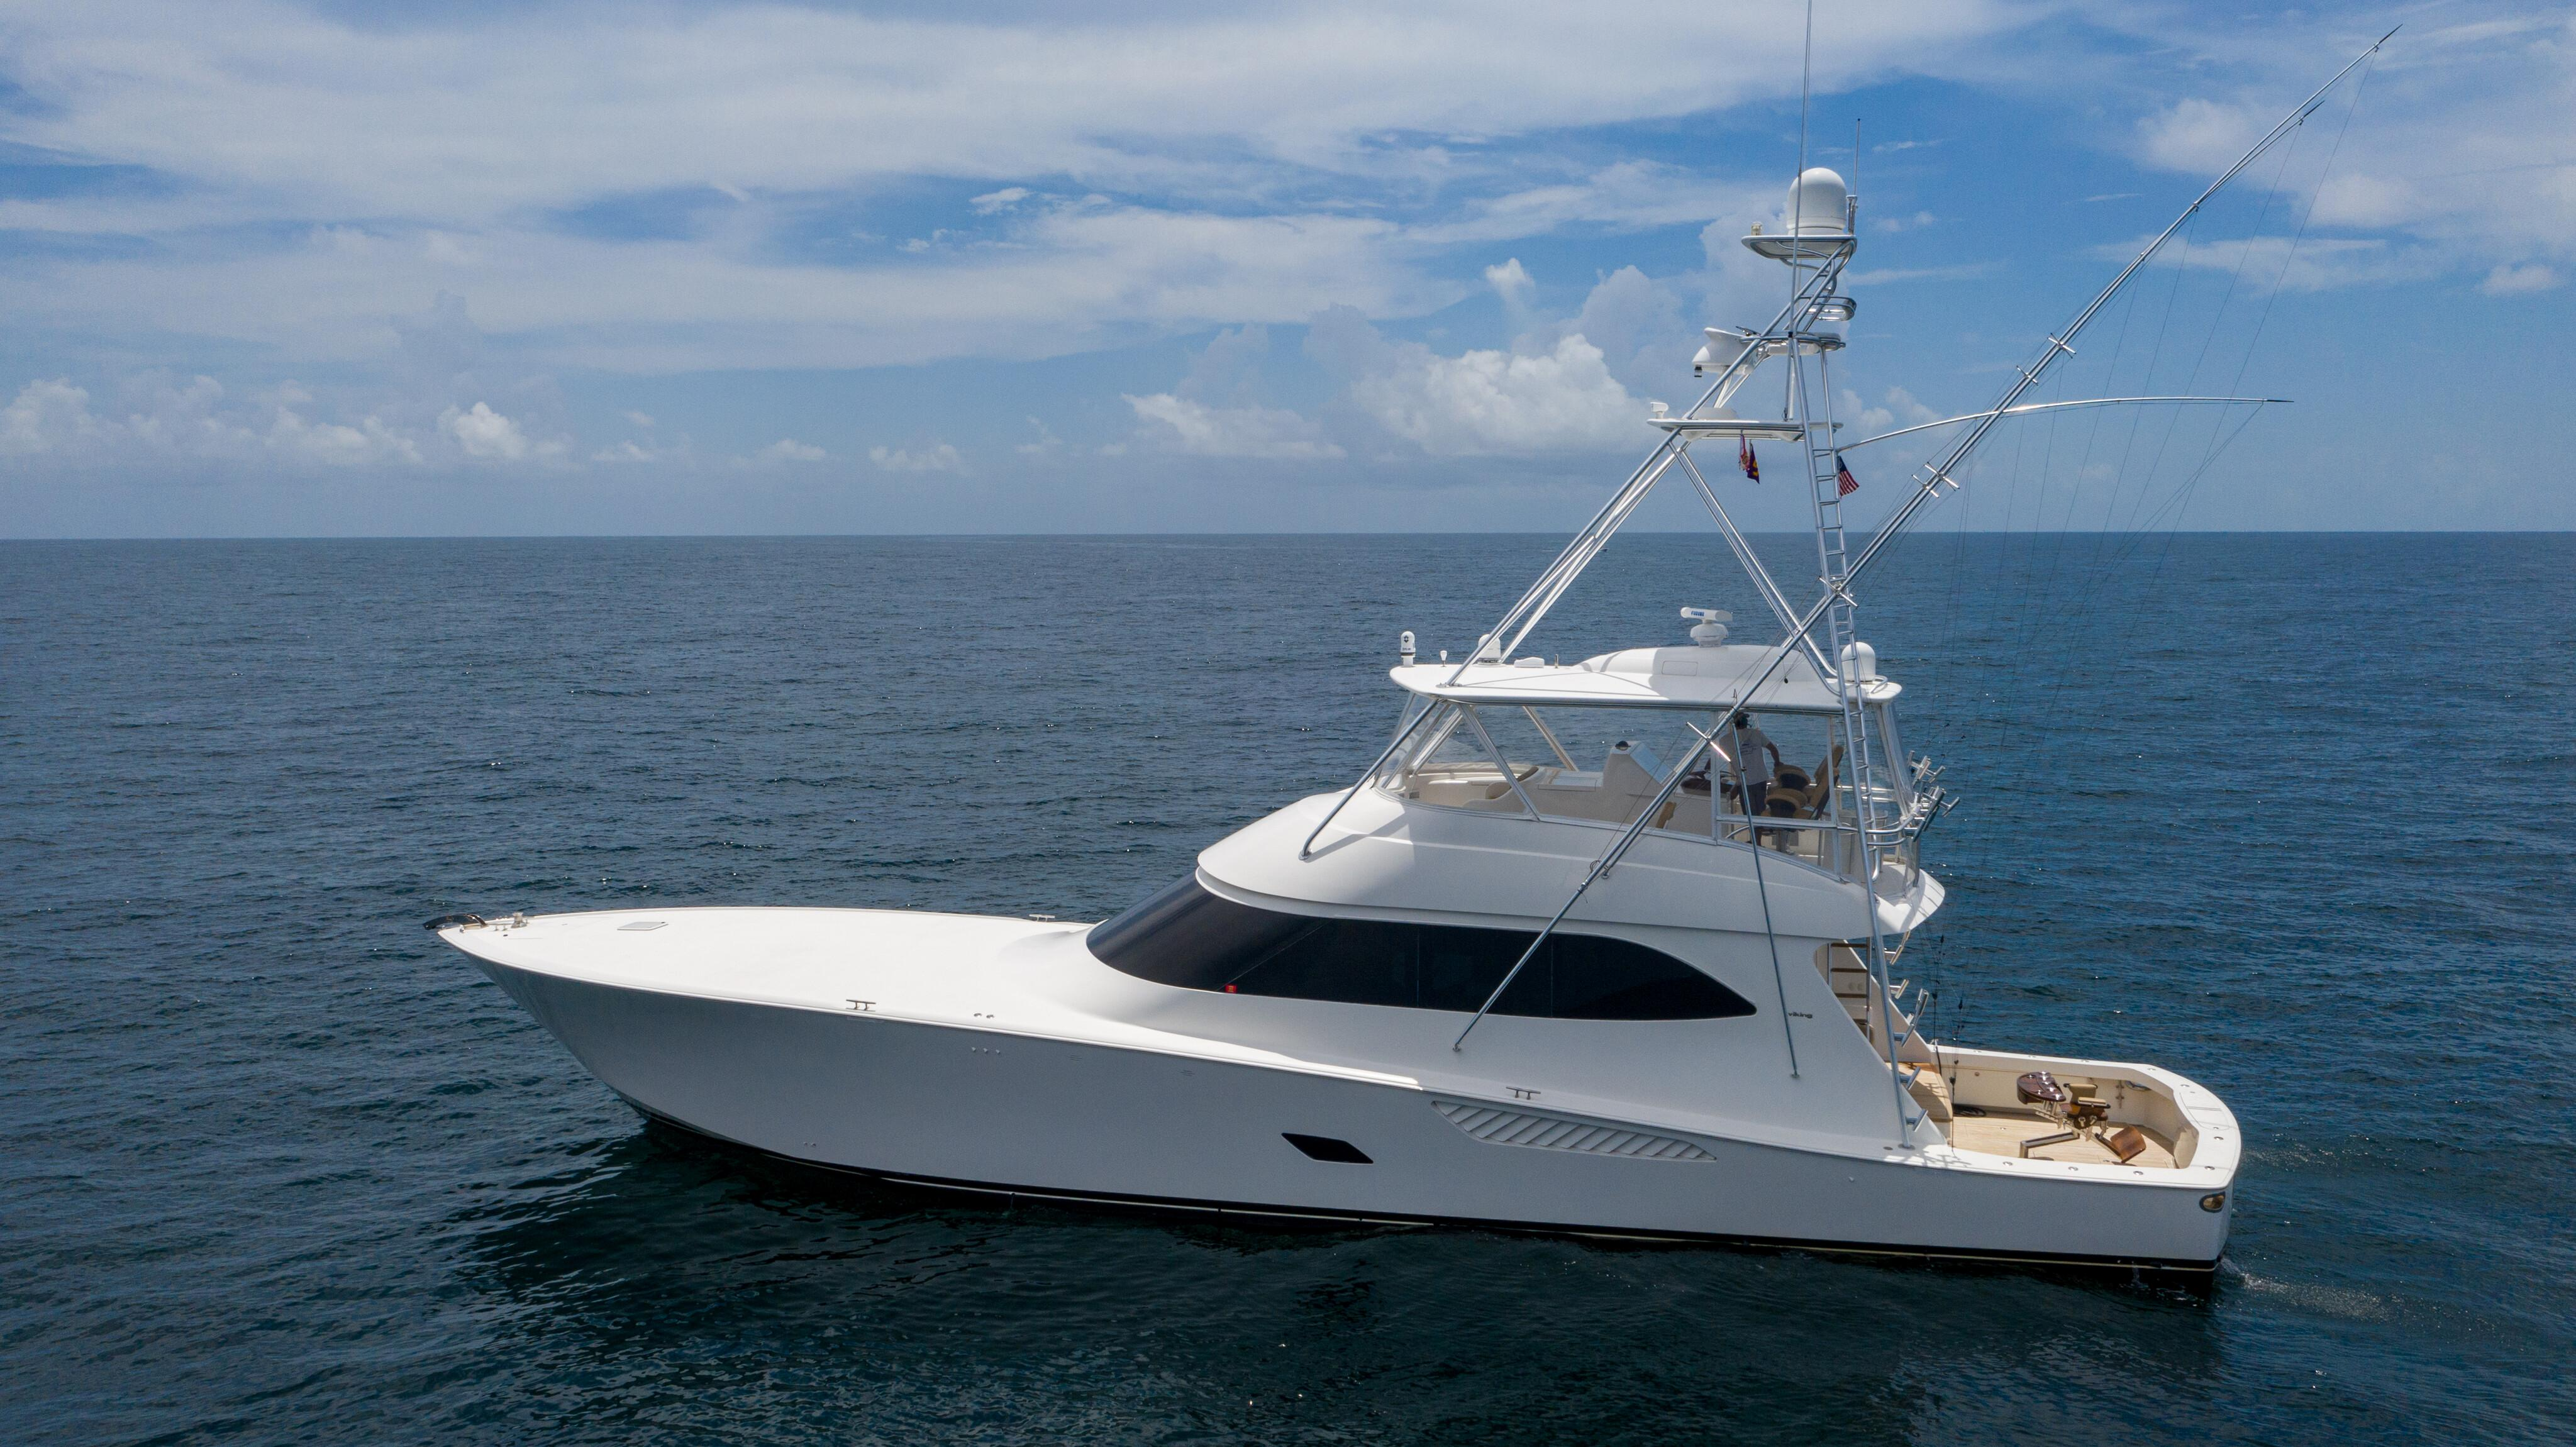 2012 76 Viking SF - Port Profile